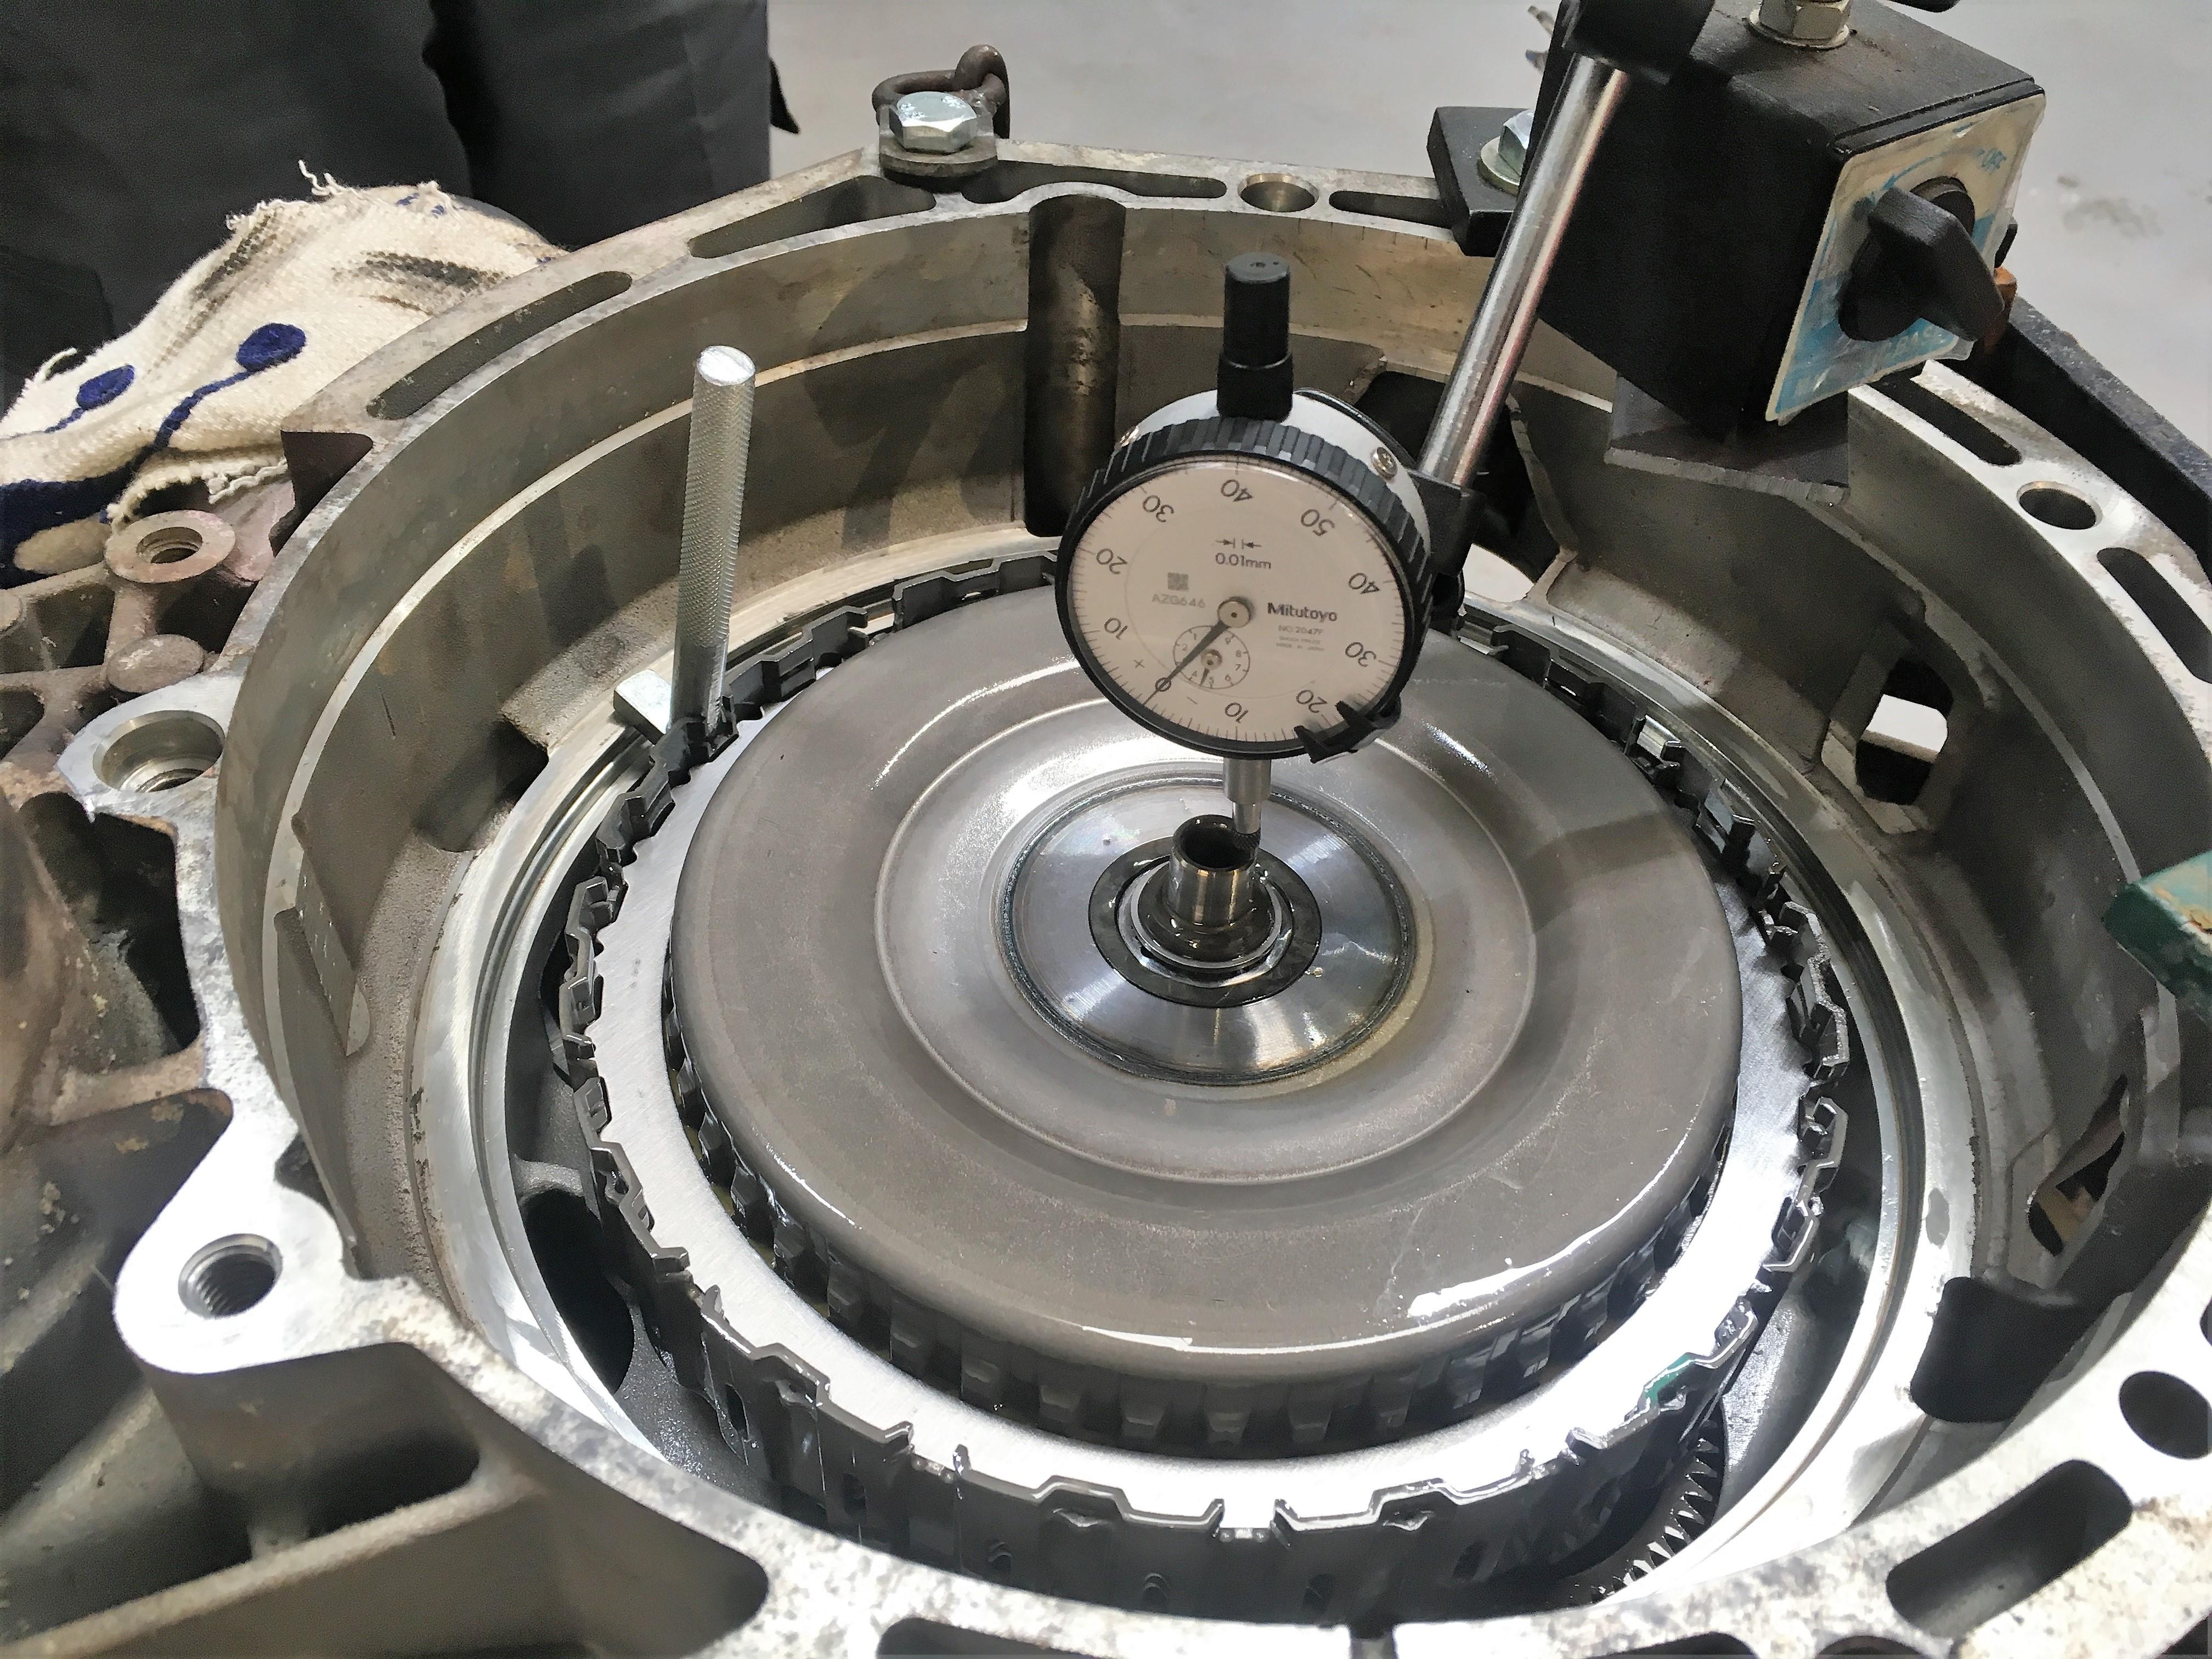 VW Audi DSG clutch replacement